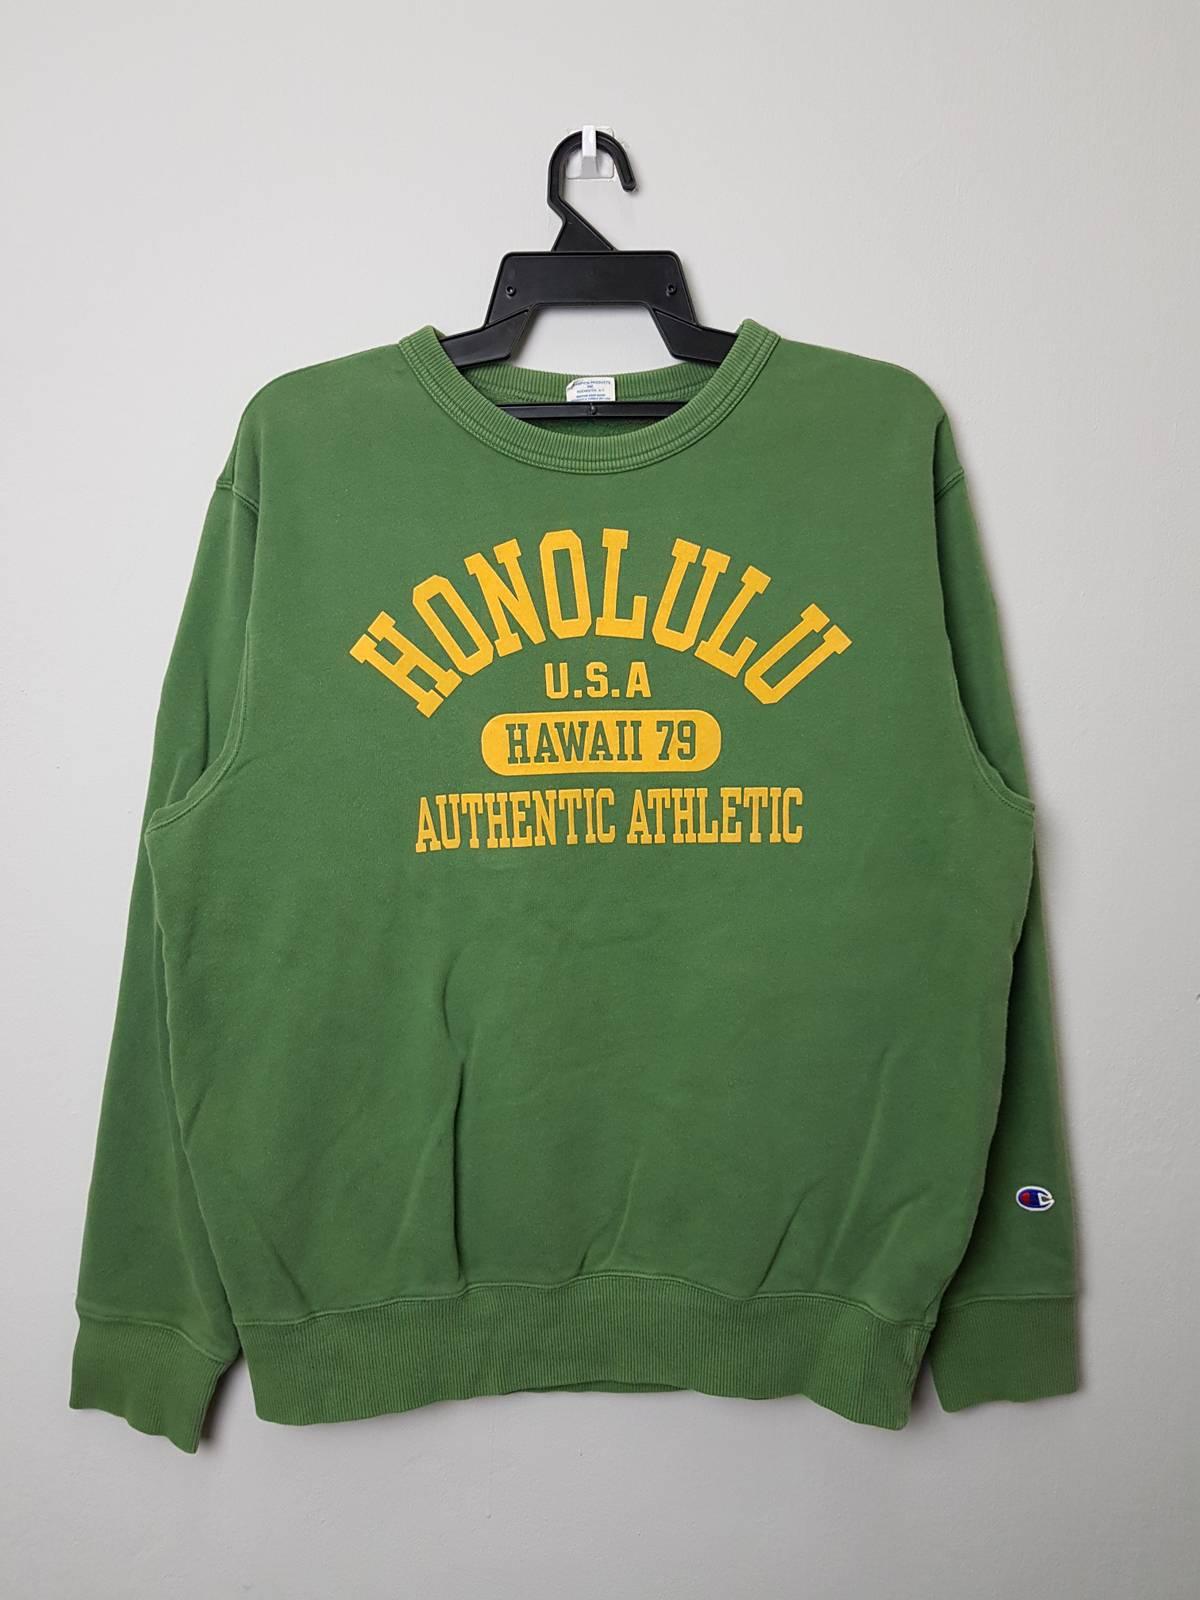 04dfd0c2e747 Vintage Vintage Champion Honolulu Authentic Athletic Sweatshirt ...